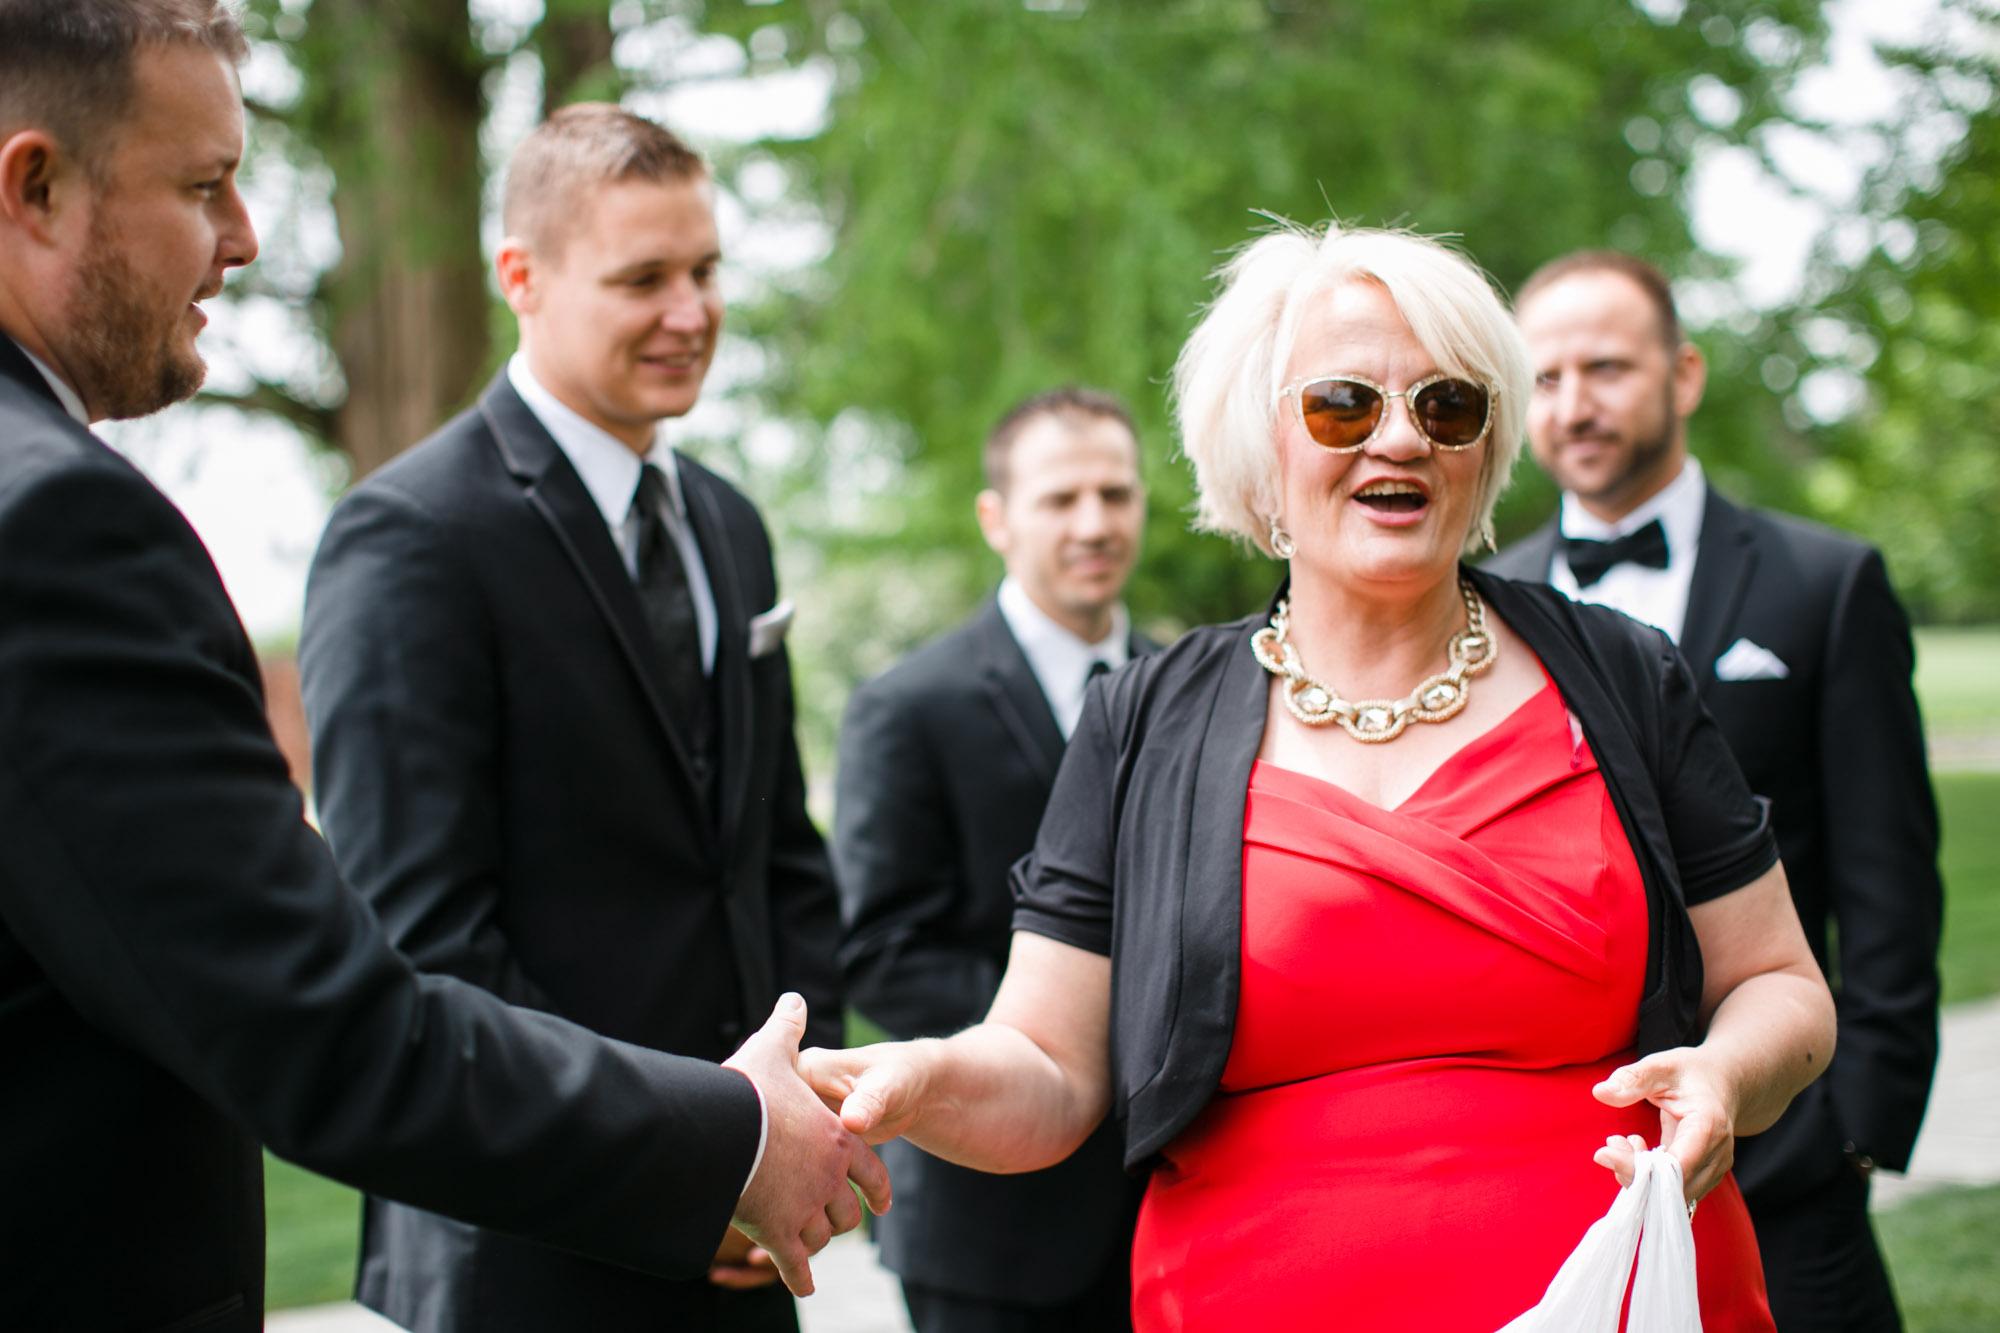 hensville-wedding-downtown-toledo-ohio (17 of 103).jpg